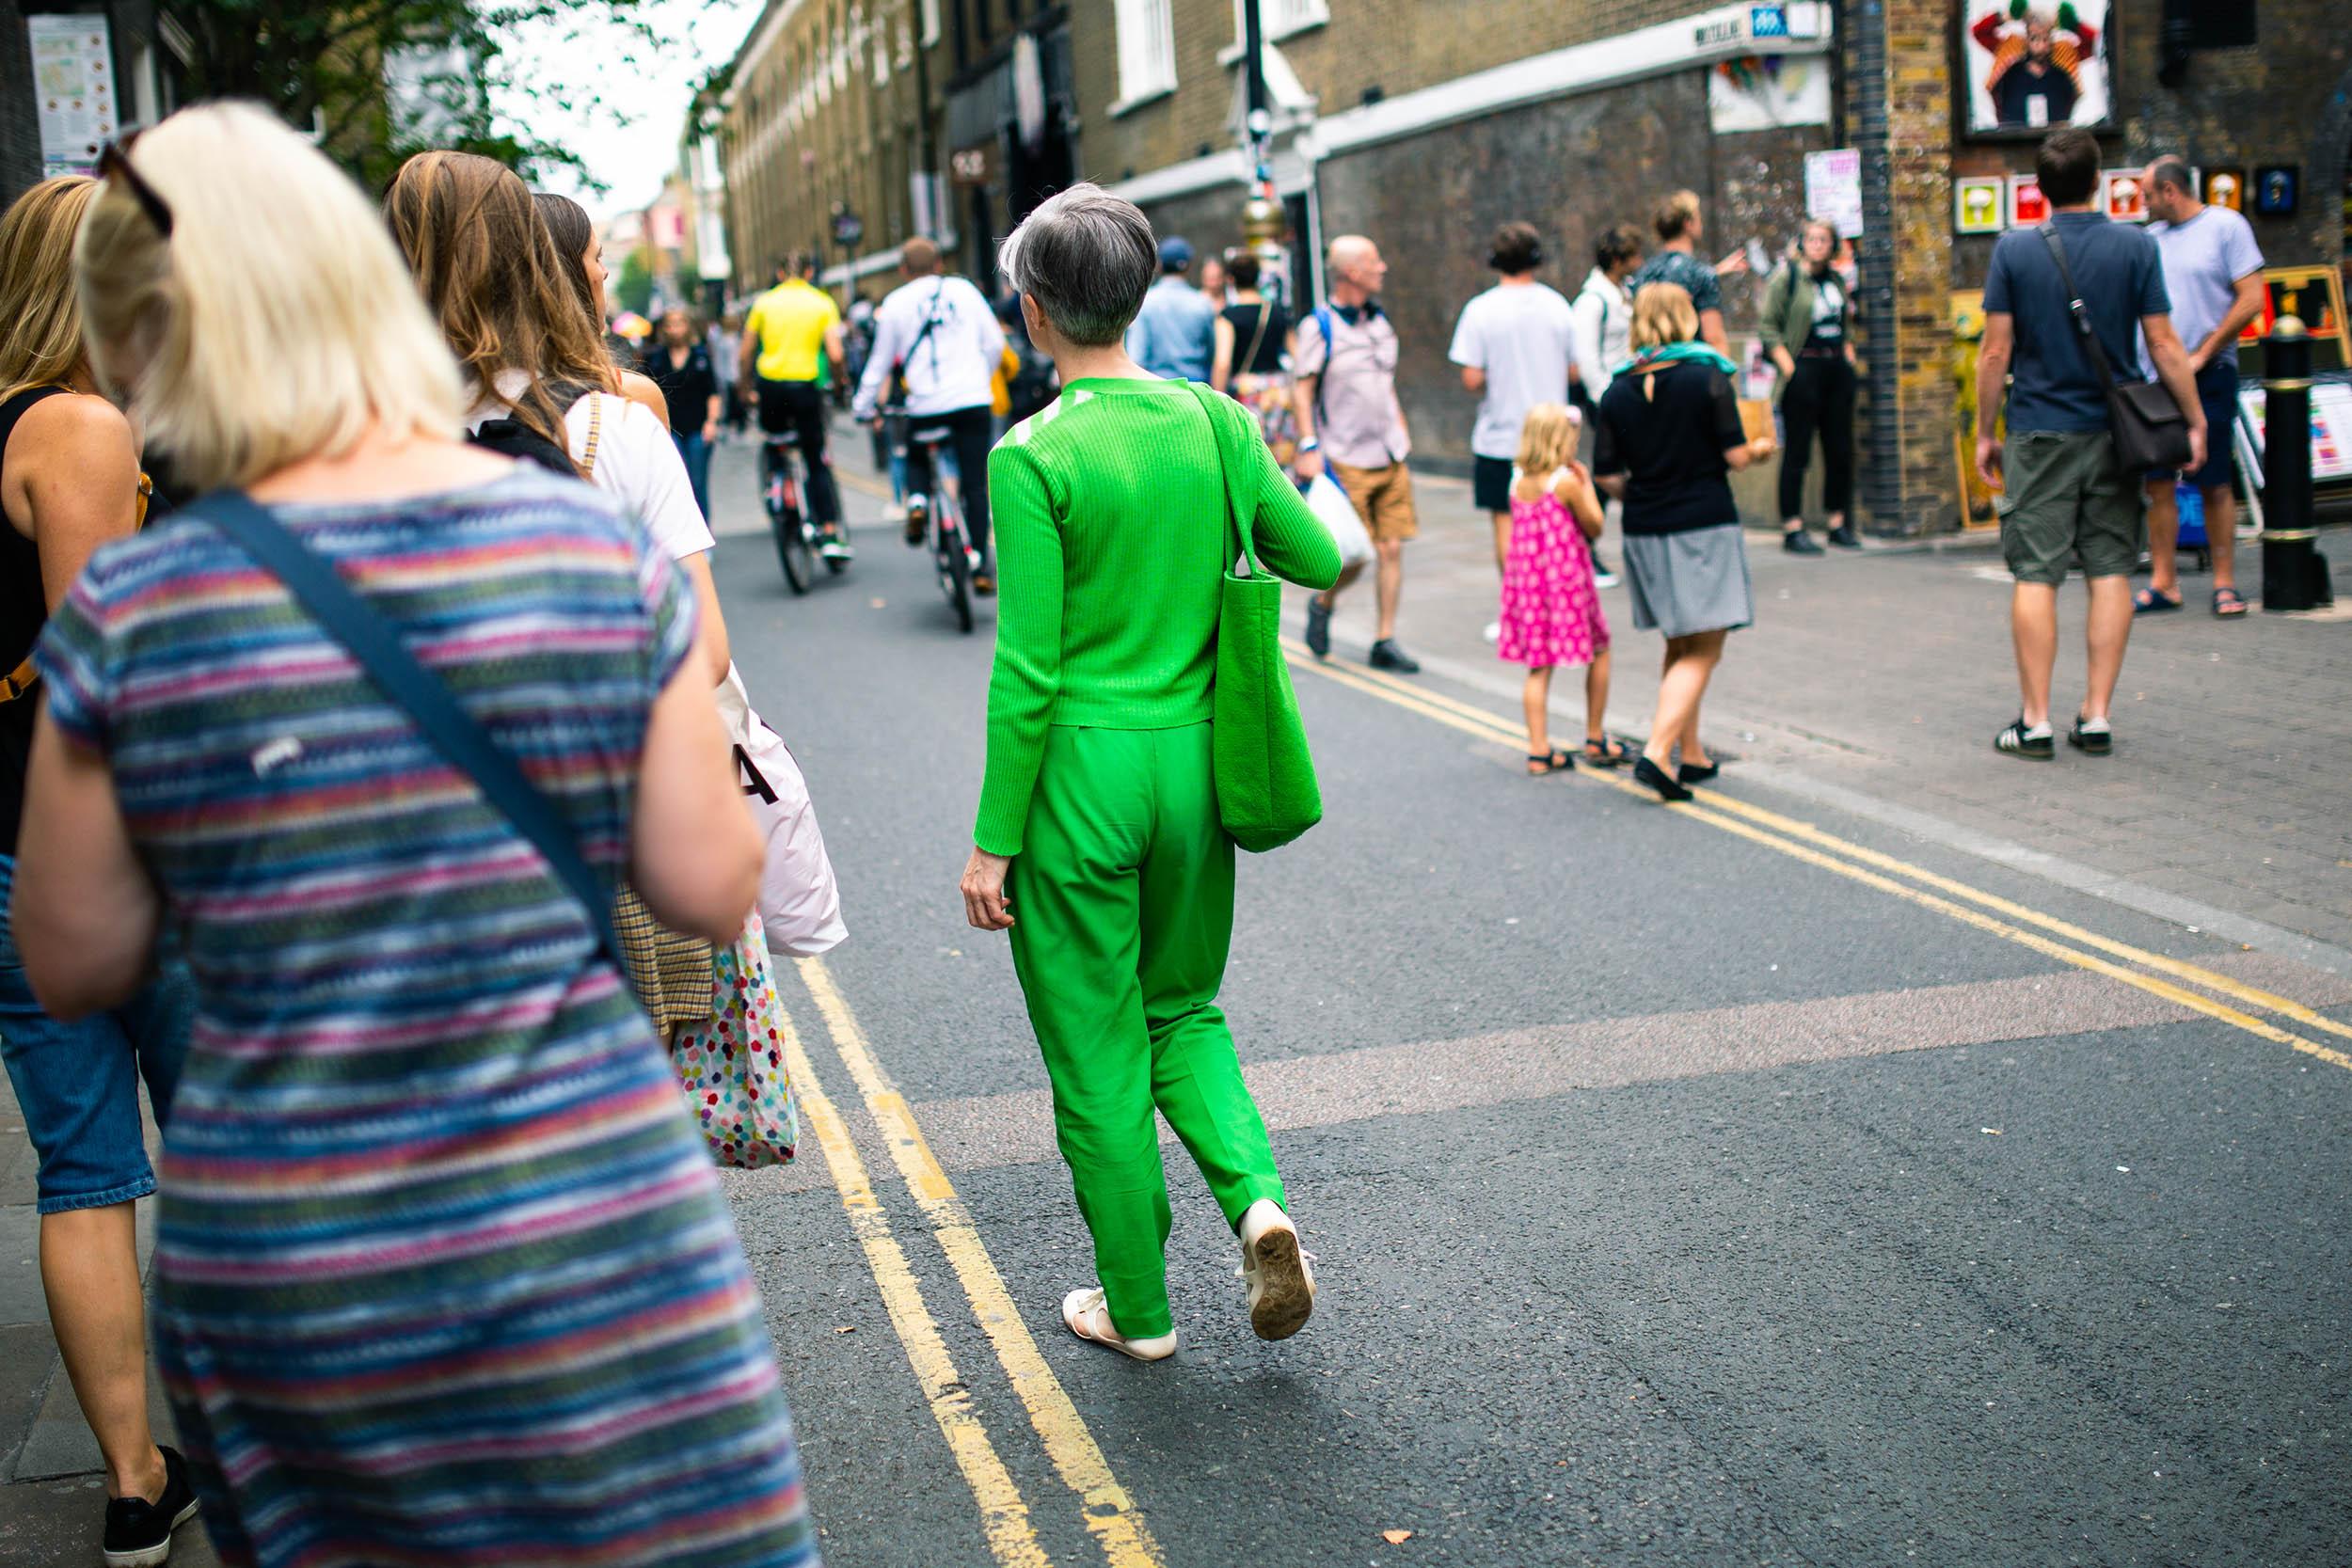 ENGLAND_LONDON_BRICKLANE_0018